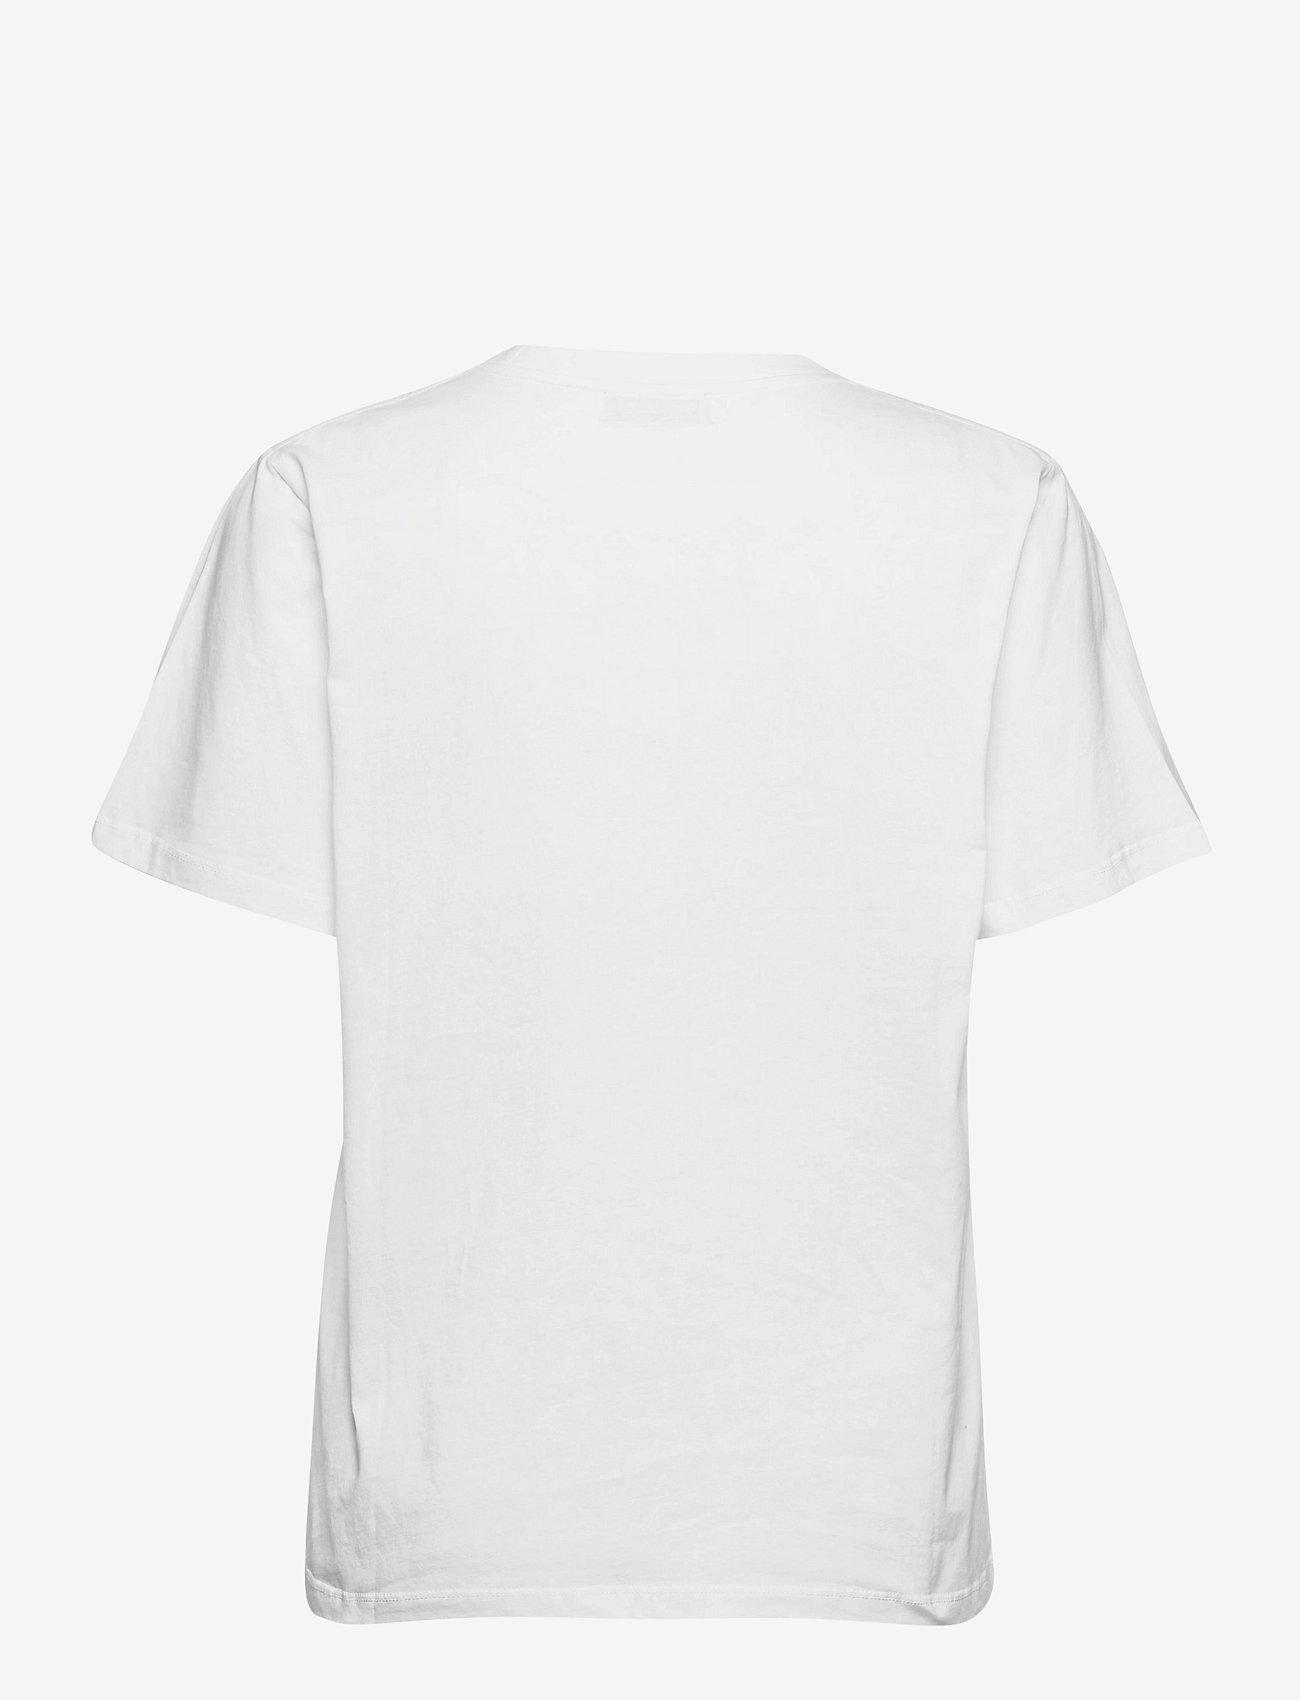 RODEBJER - RODEBJER MONOGRAM T - t-shirts - white - 1